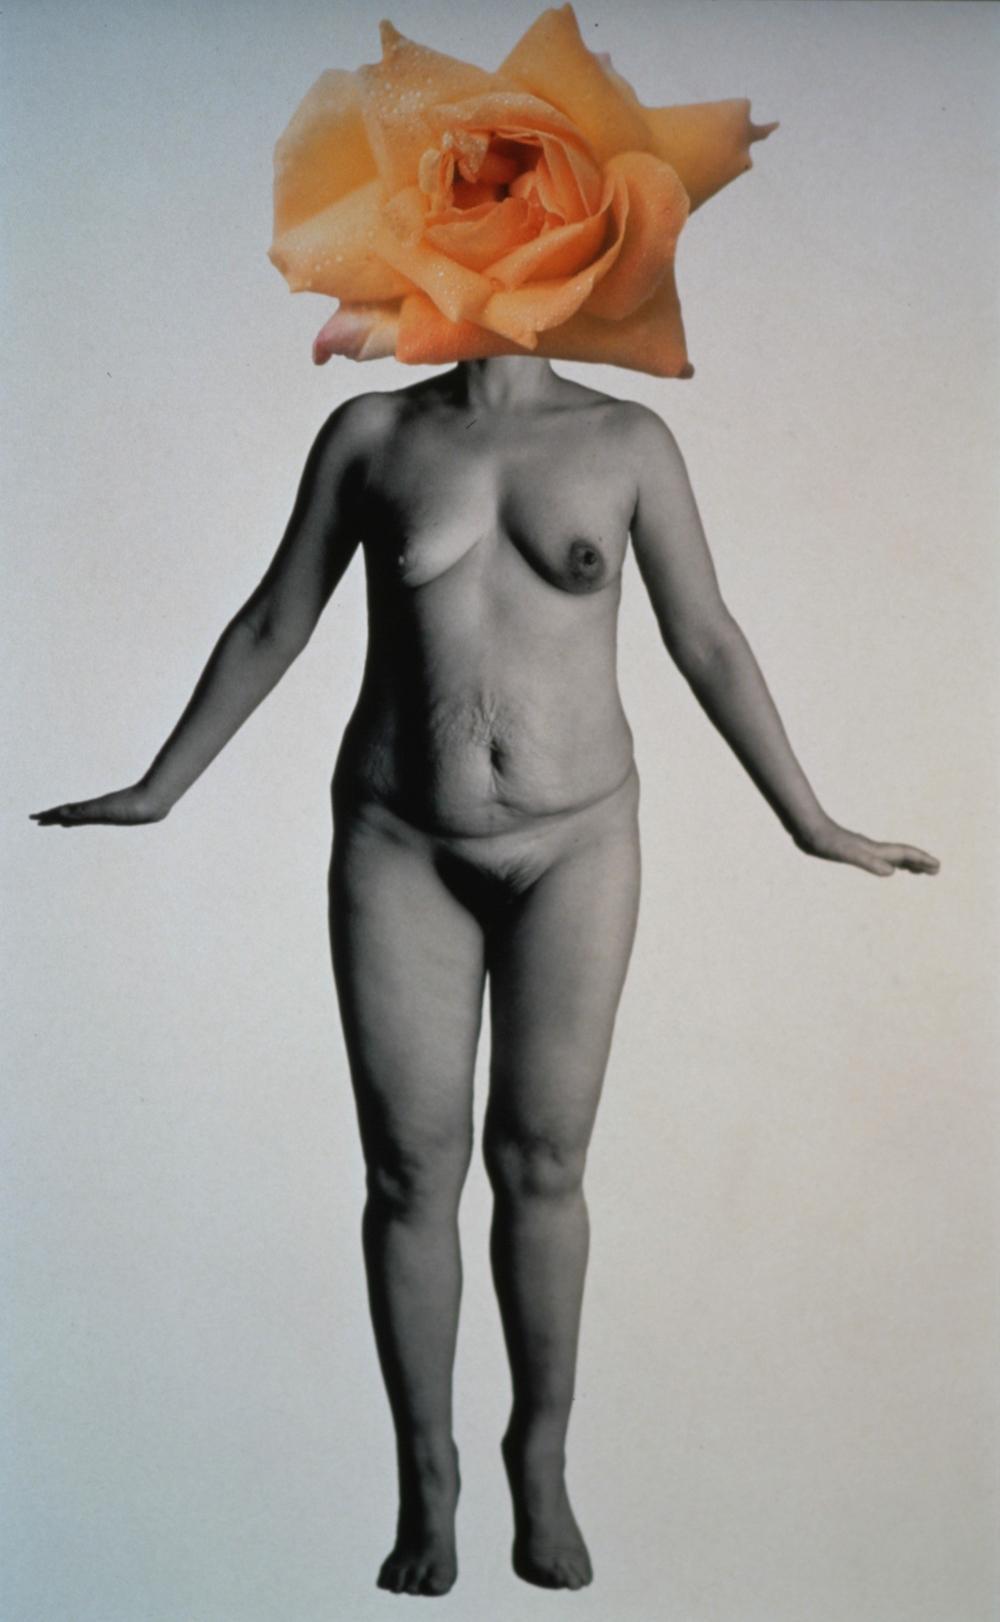 Arario. Body and Sexuality #3, 1998, C-print, 175 x 110 cm, Ed. 3 of 10, USD 10-20k (15,000) (1).jpg